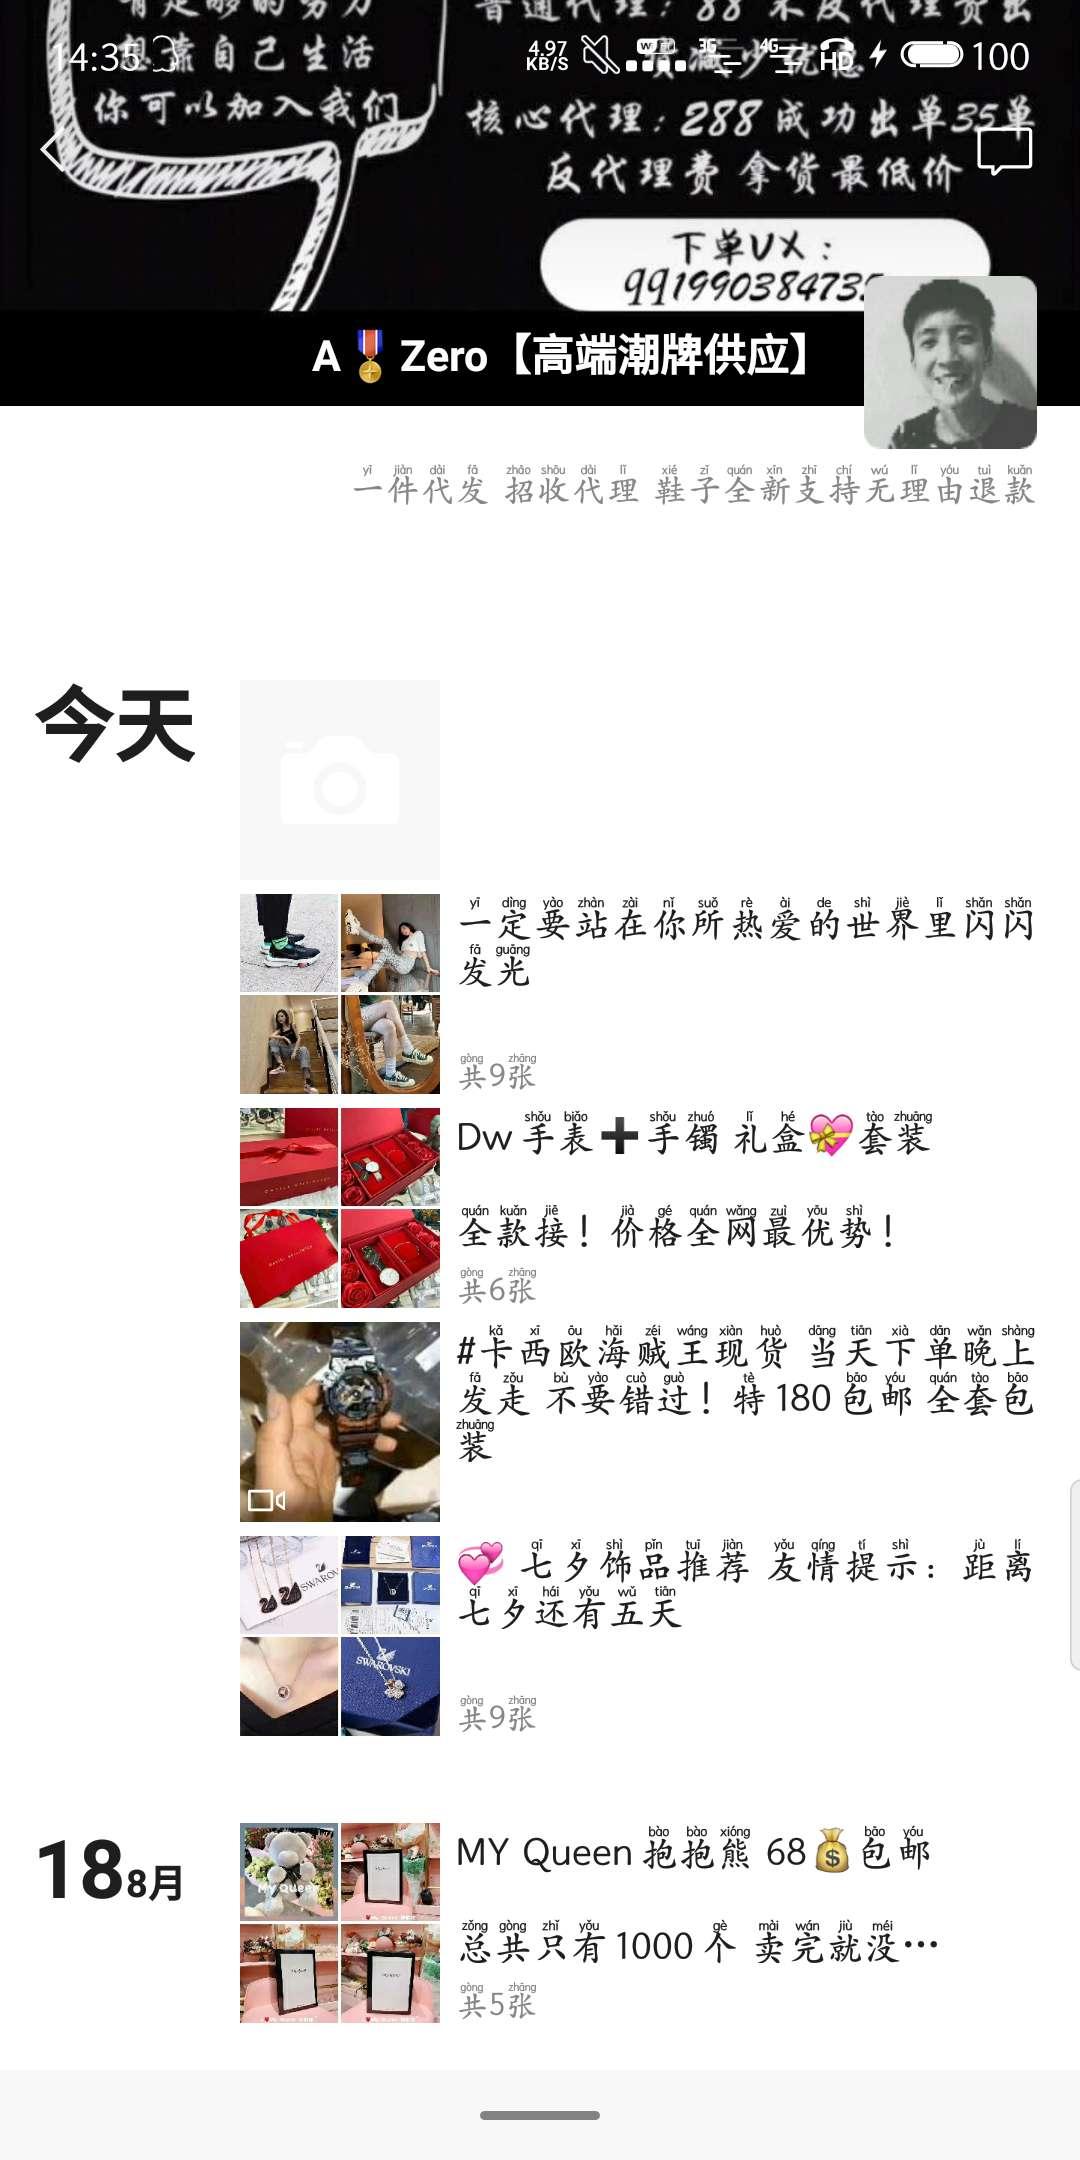 Kv9HfQcOTILOx6kP__thumbnail.png